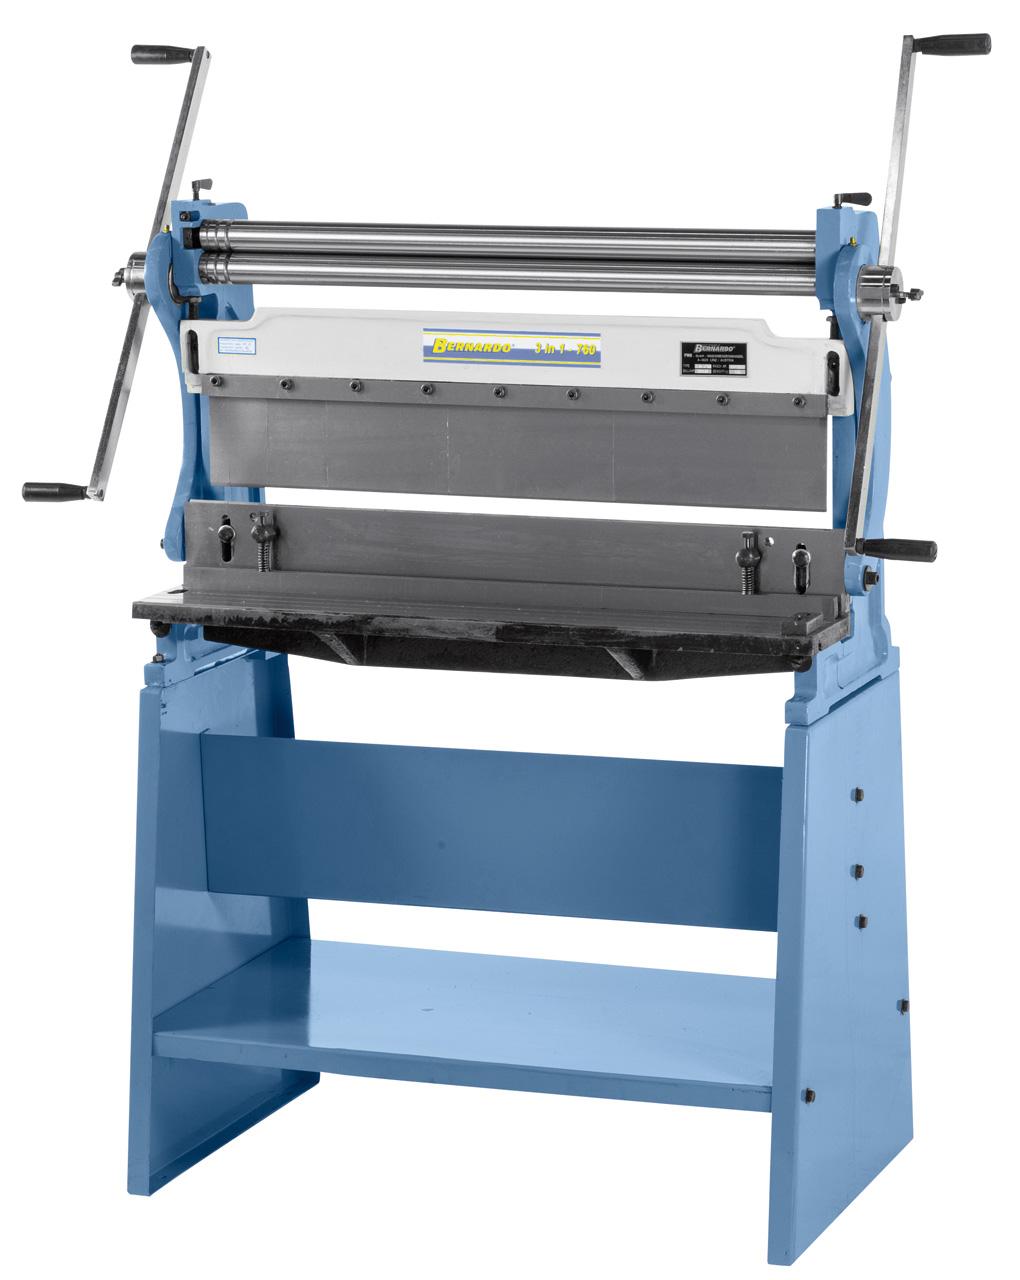 Pladebearbejdningsmaskine 3 i 1 Bernardo - 760mm